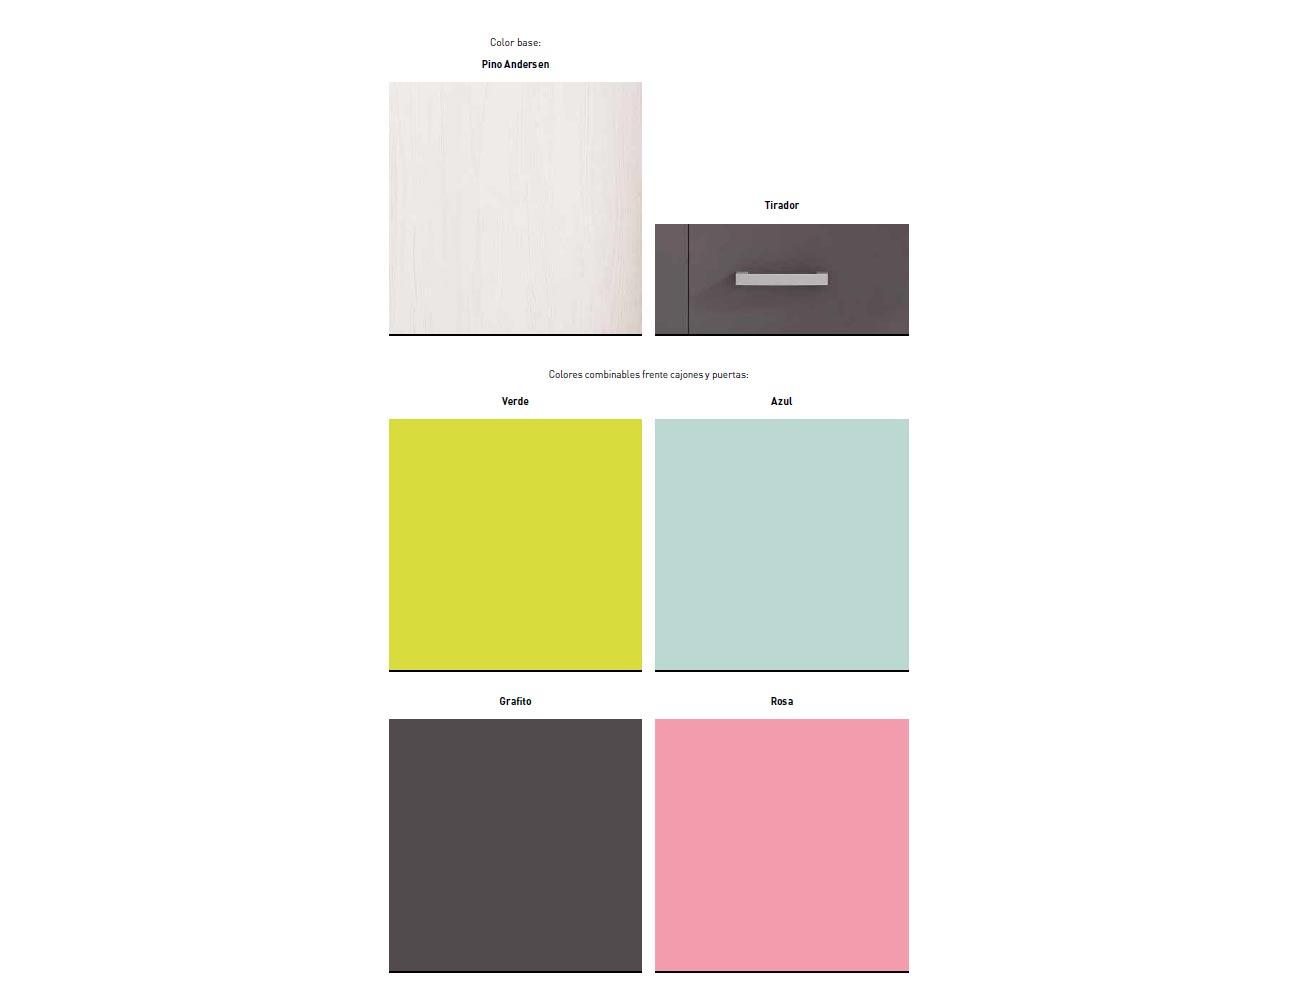 Colores 185